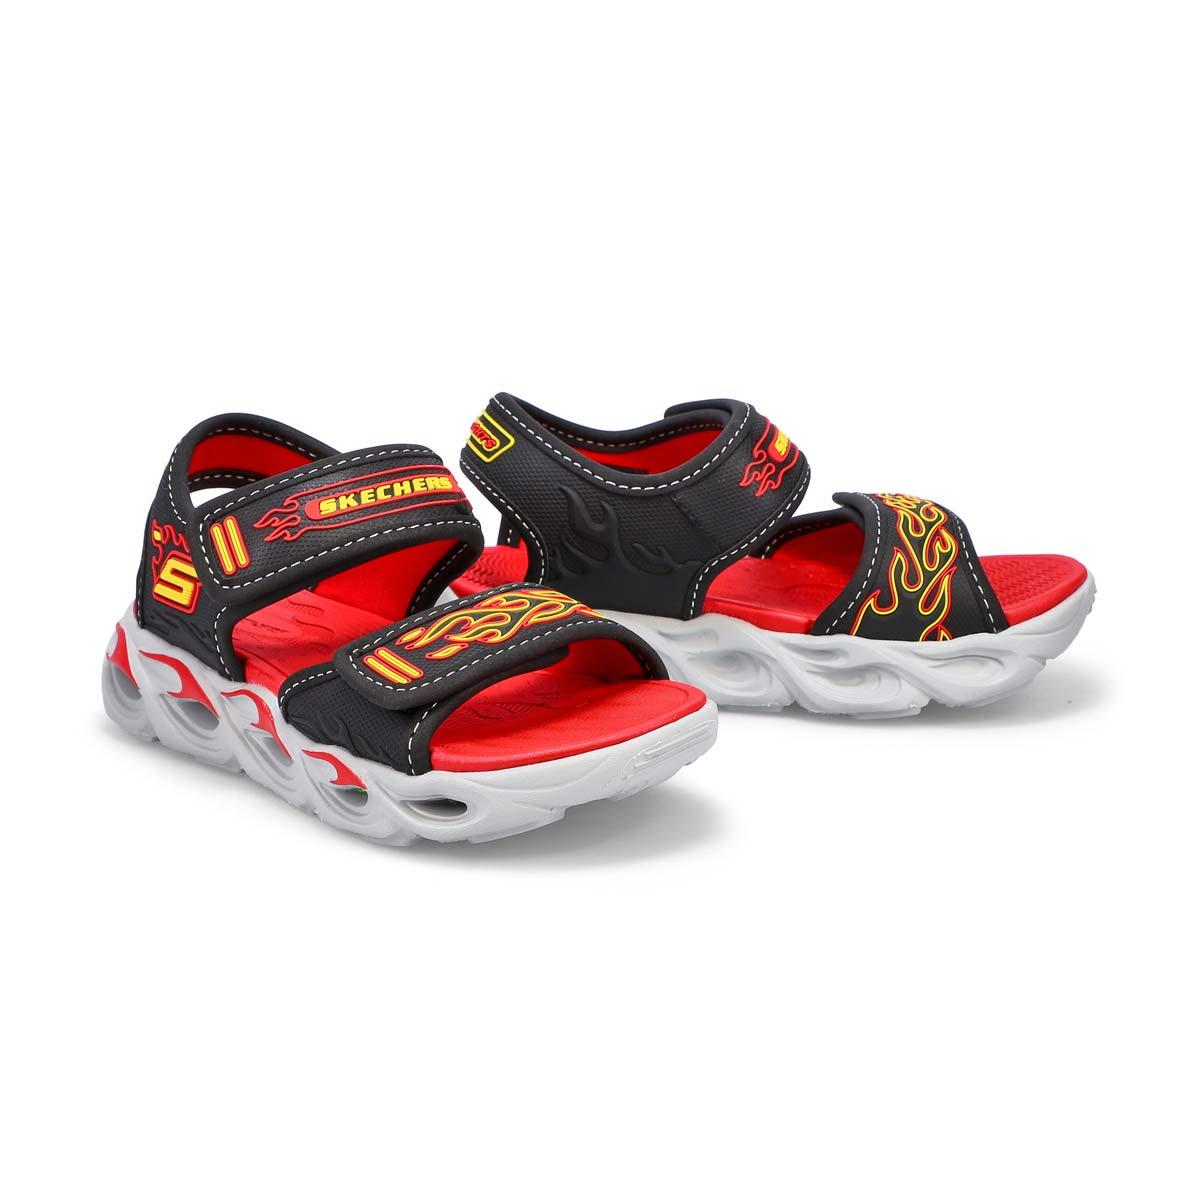 Boys' Thermo Splash Sandal - Black/Red